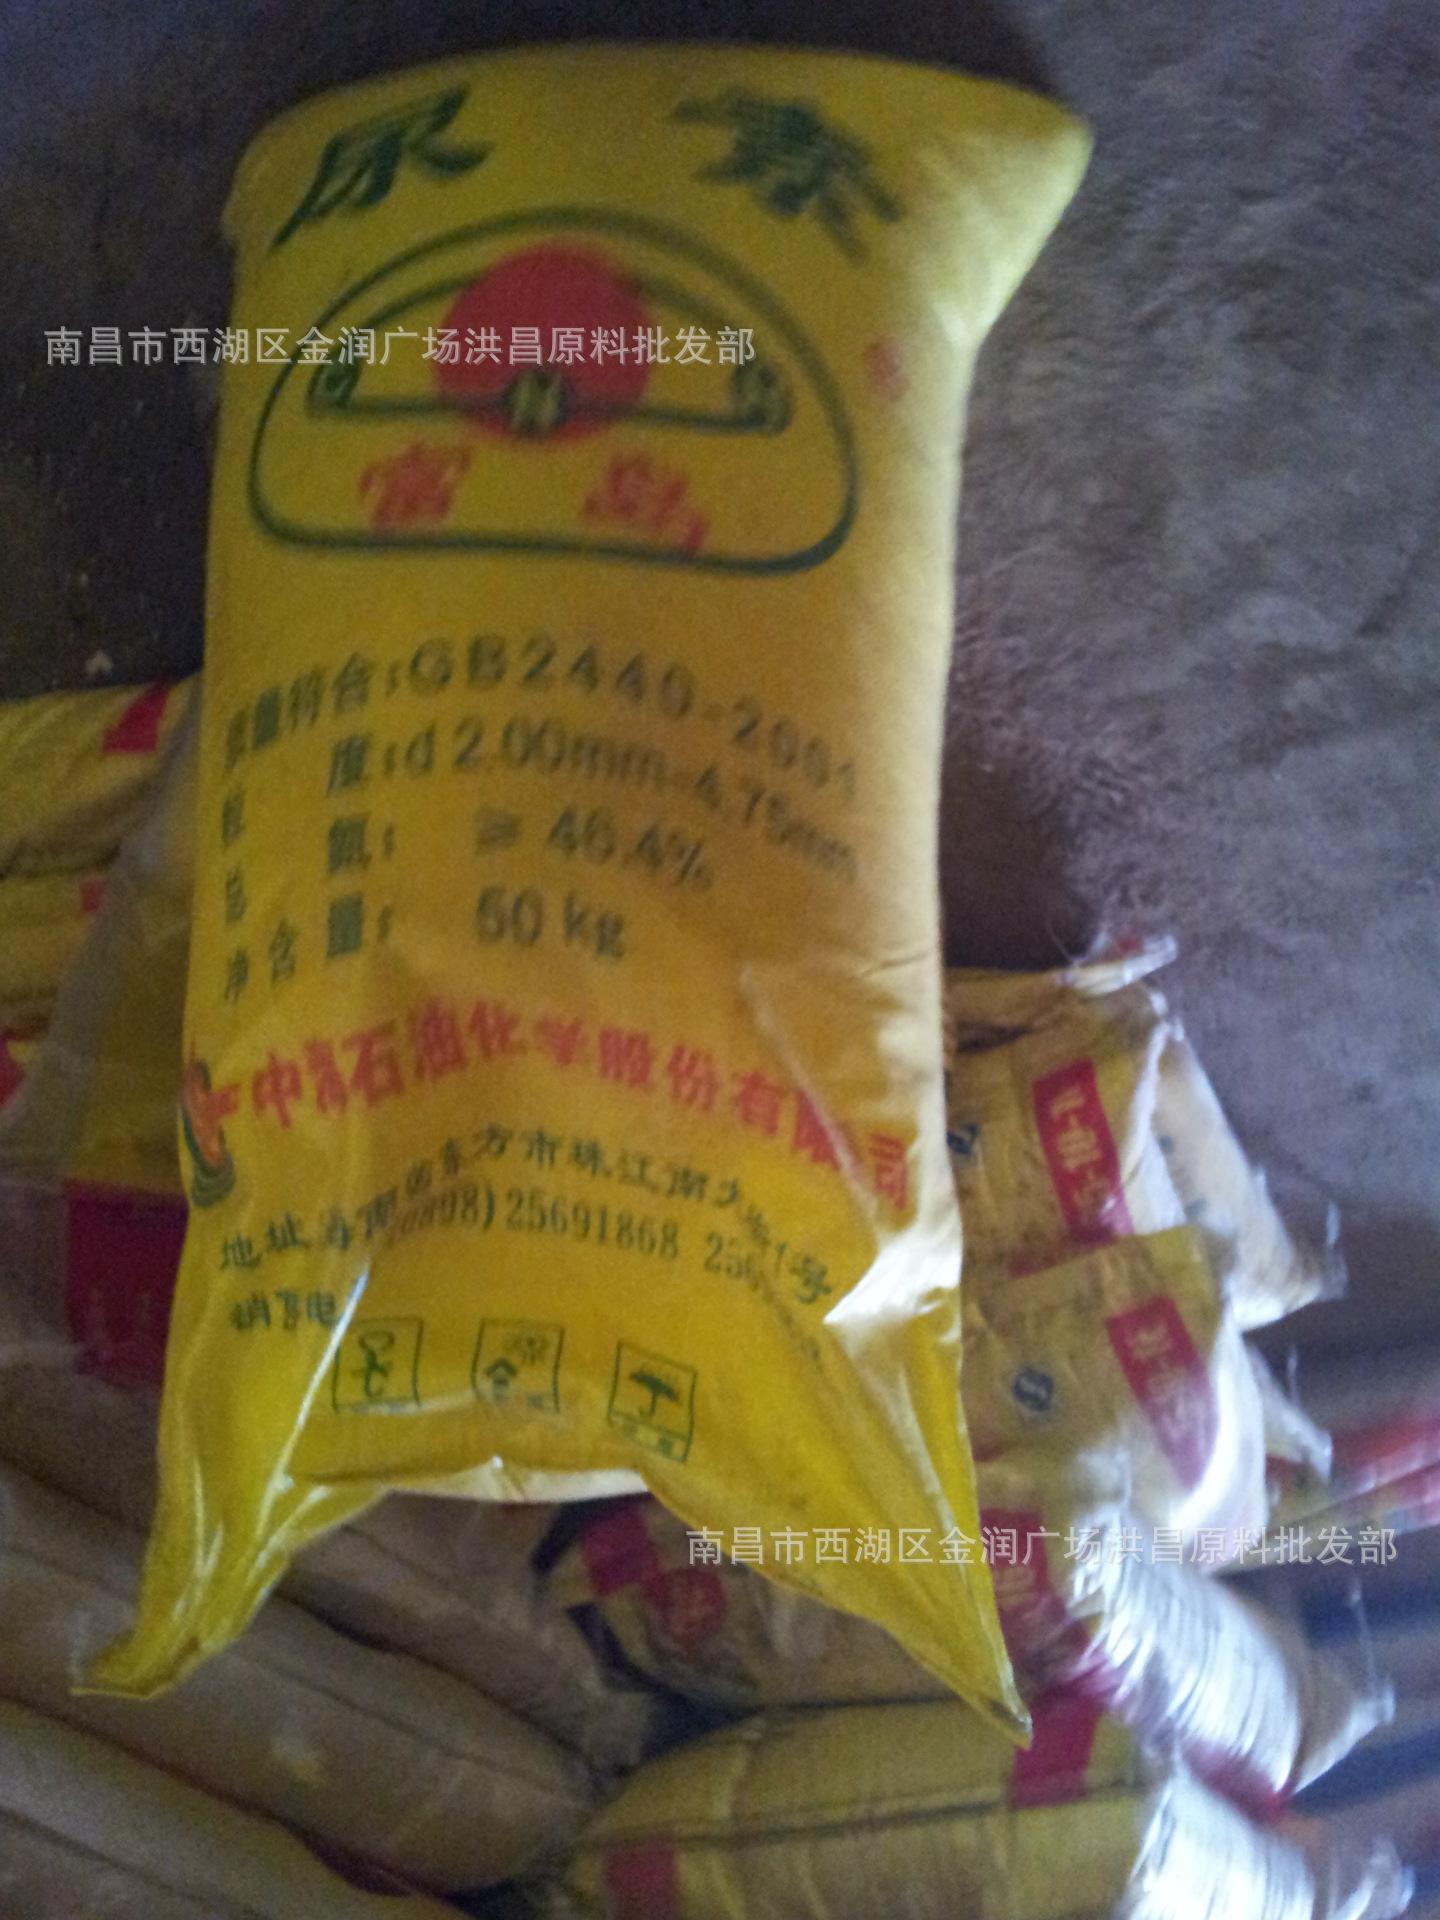 Phân bón Hainan richisland brand agricultural large granule urea urea fertilizer